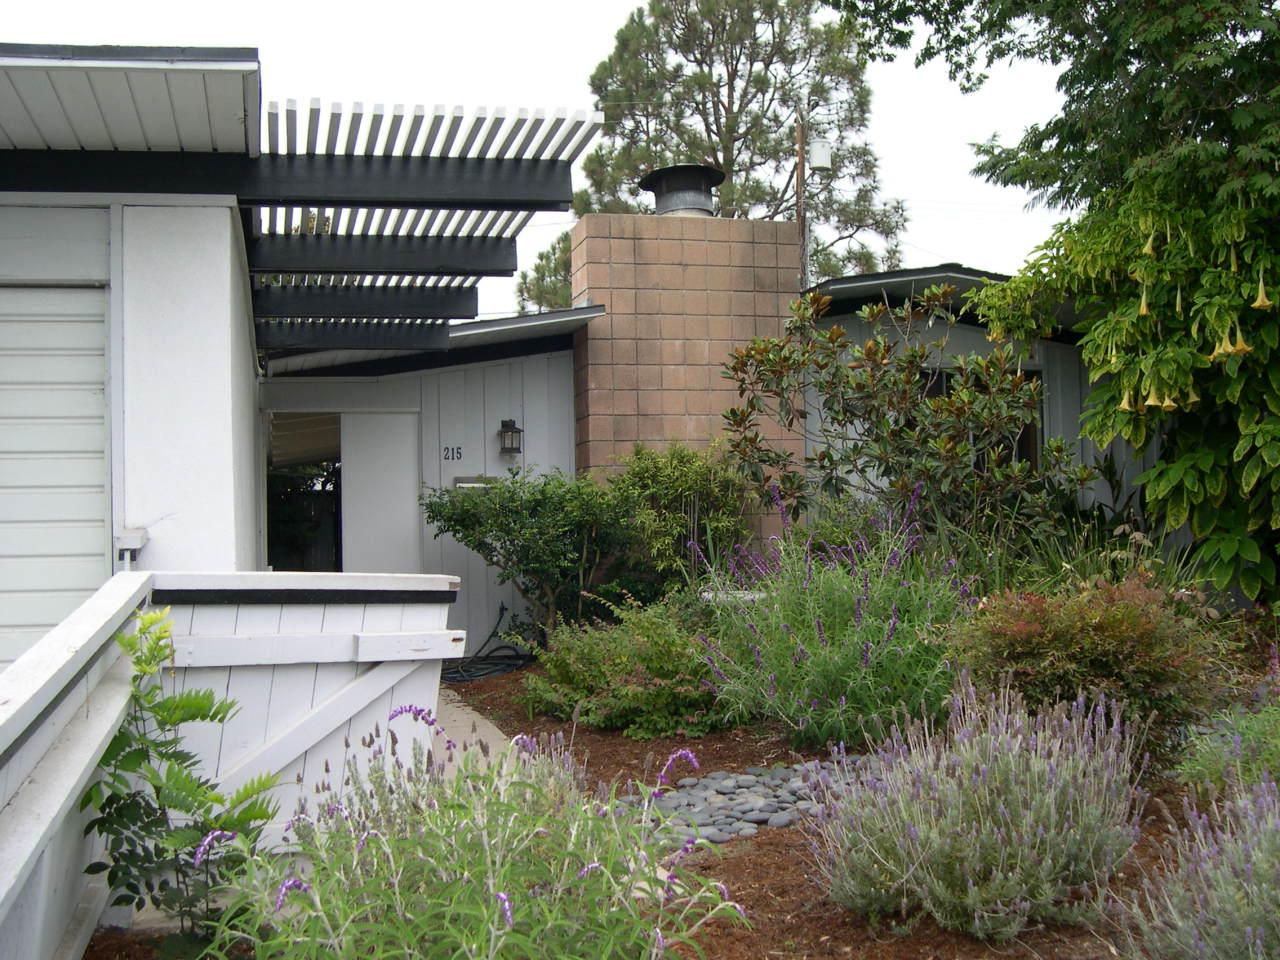 Property photo for 215 La Jolla Dr Santa Barbara, California 93109 - 12-2847